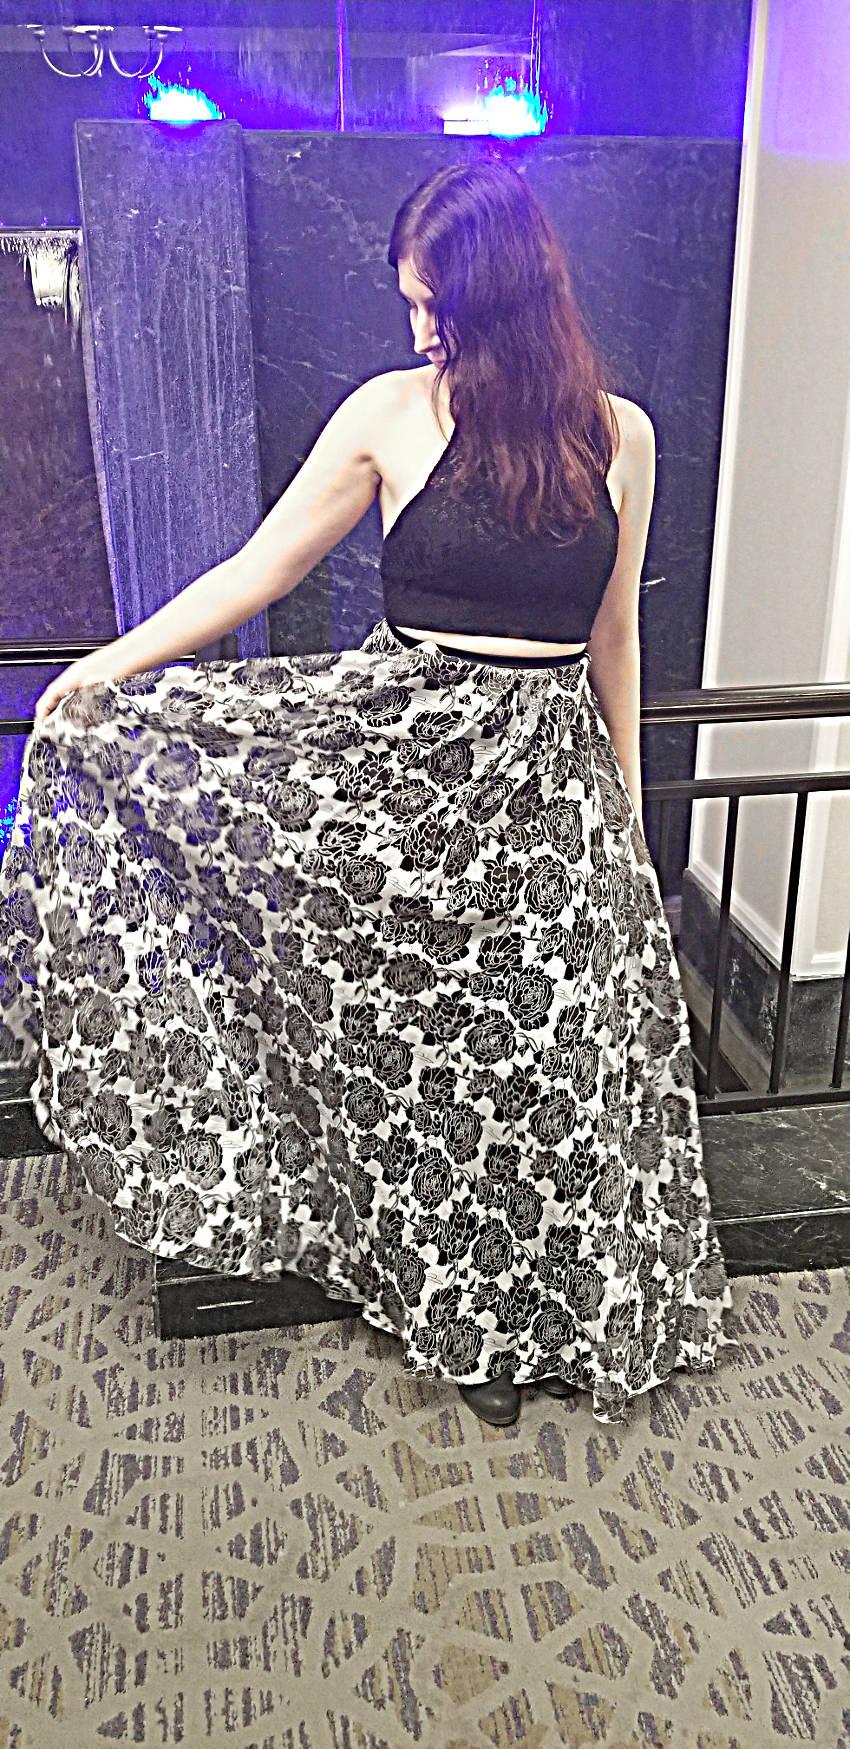 Polar Bear Style Black White Chiffon Roses Lace Two-Piece Dress